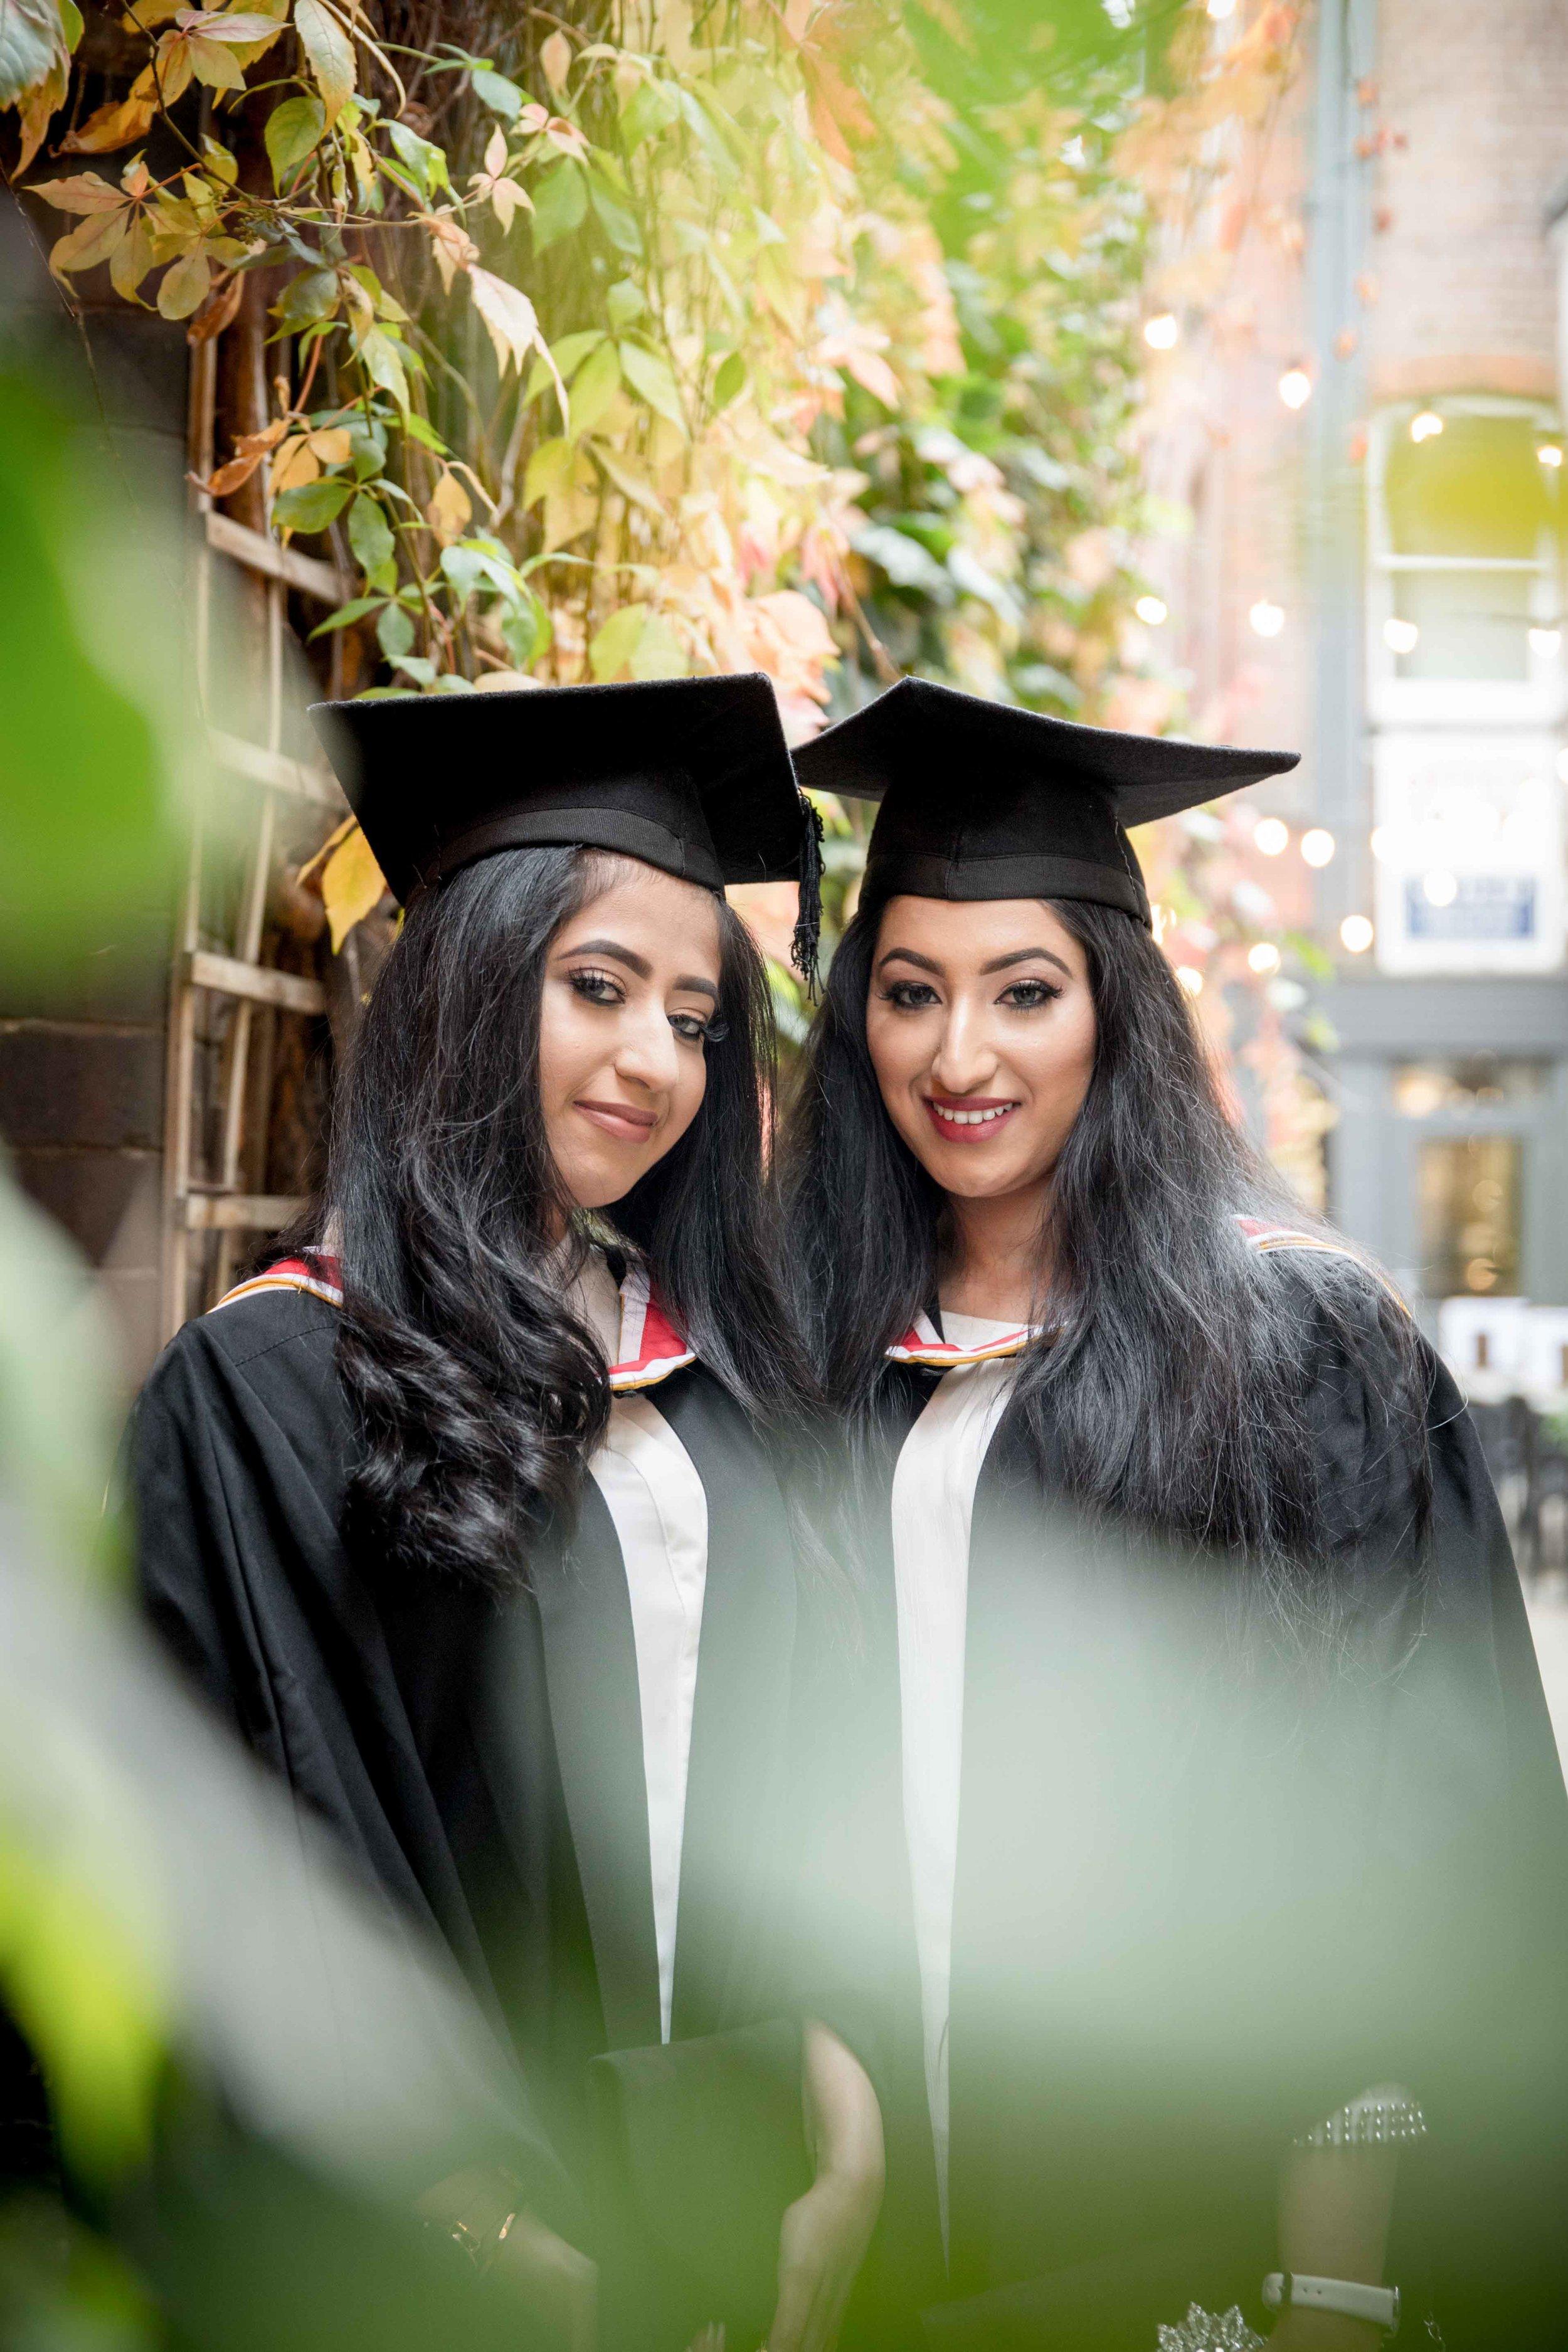 chester-university-graduation-ceremony-photography-photoshoot-graduation-photographer-Bristol-London-Cardiff-Birmingham-Chester-Natalia-smith-photography-2.jpg